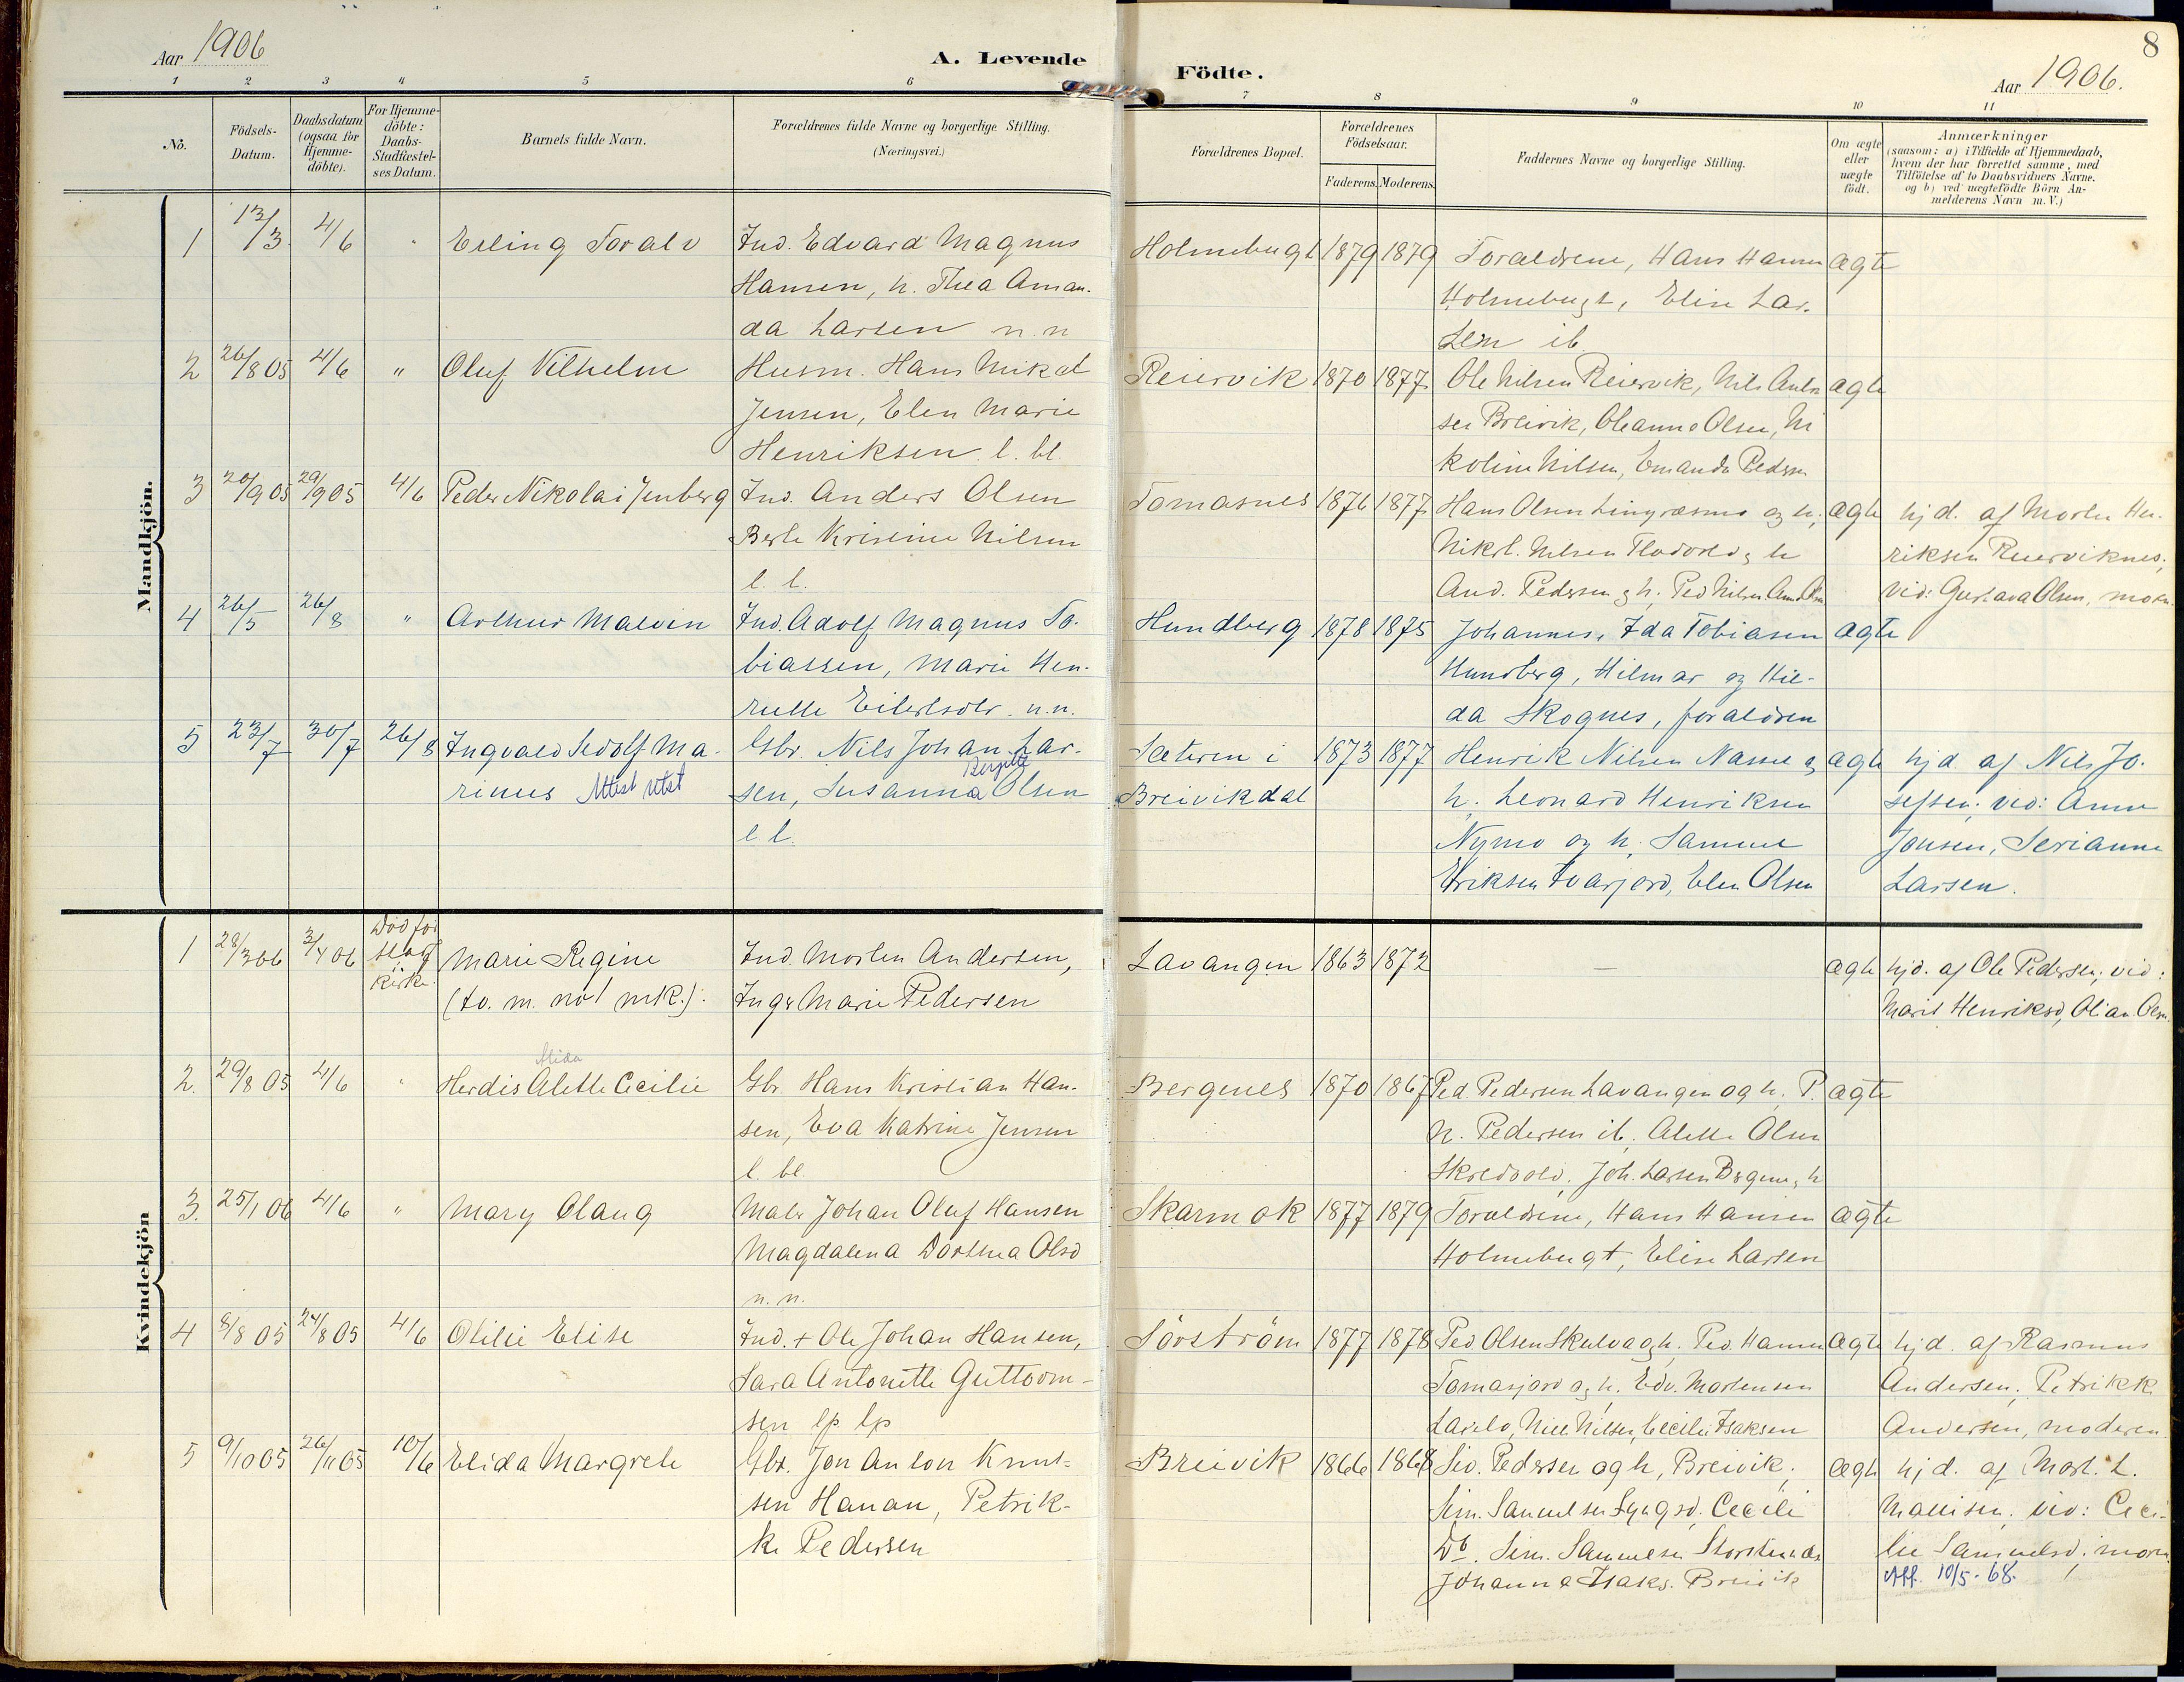 SATØ, Lyngen sokneprestembete, Ministerialbok nr. 14, 1905-1920, s. 8